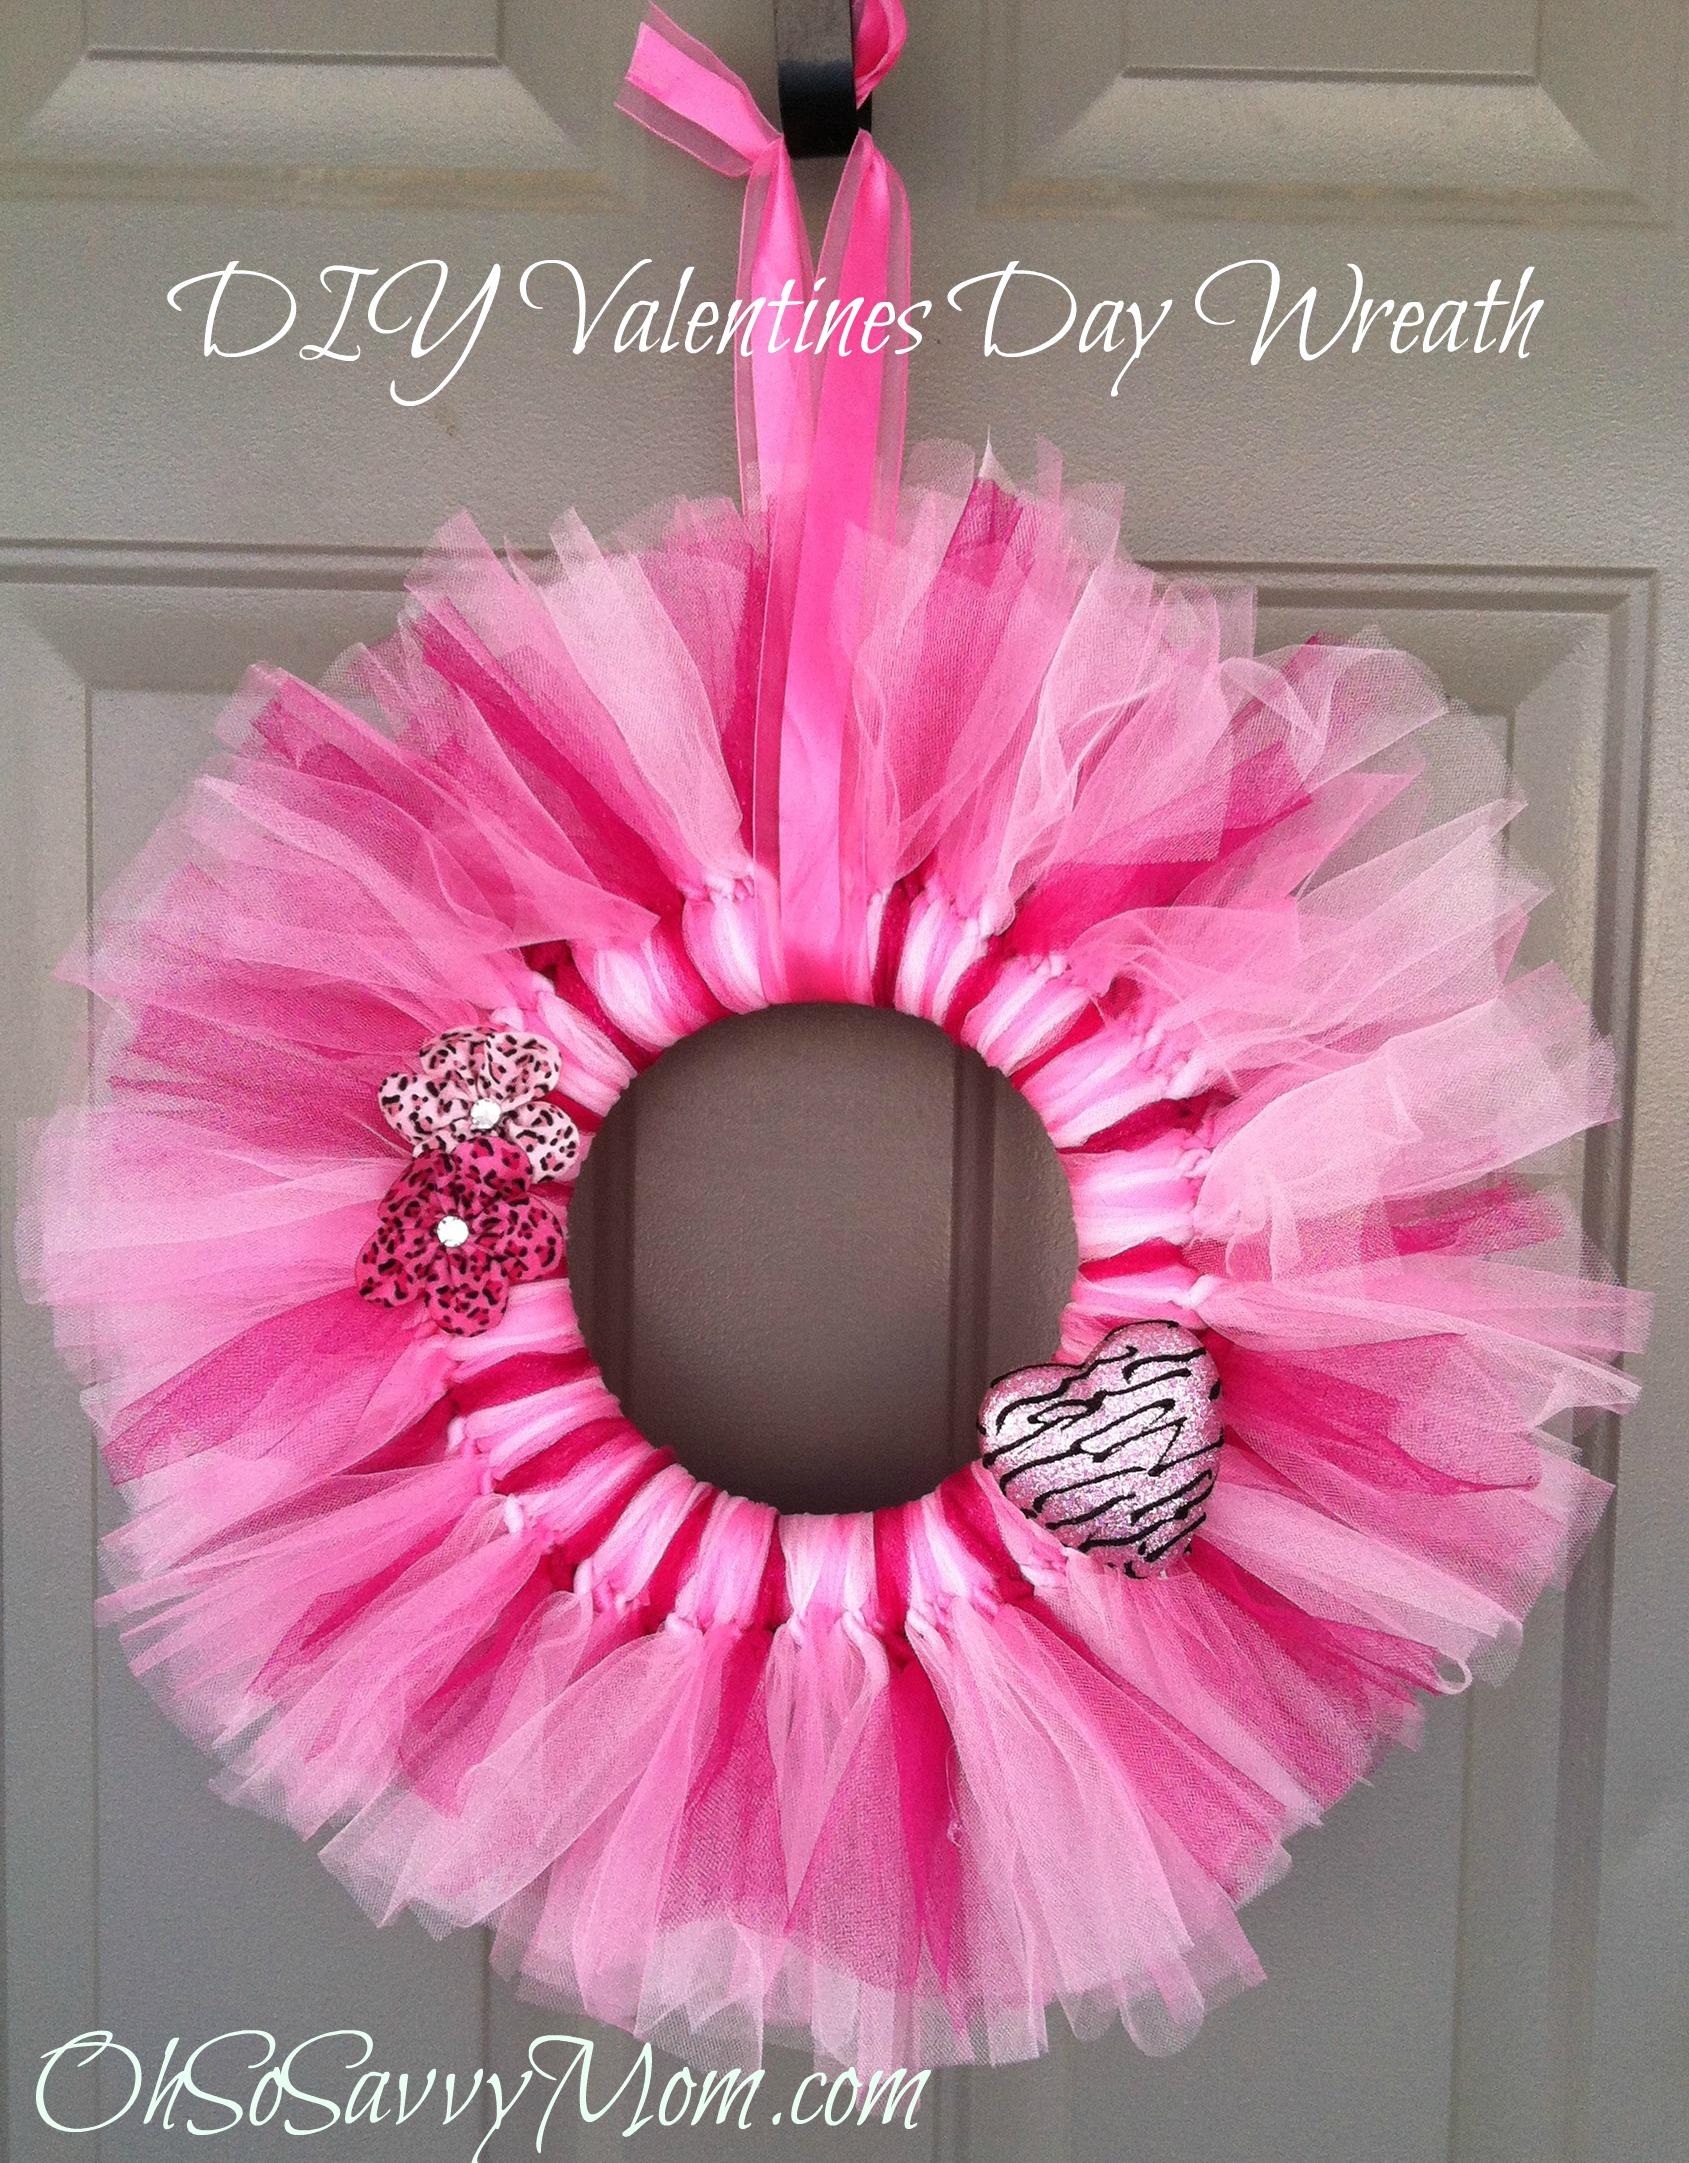 Valentines day door wreath diy oh so savvy mom rubansaba